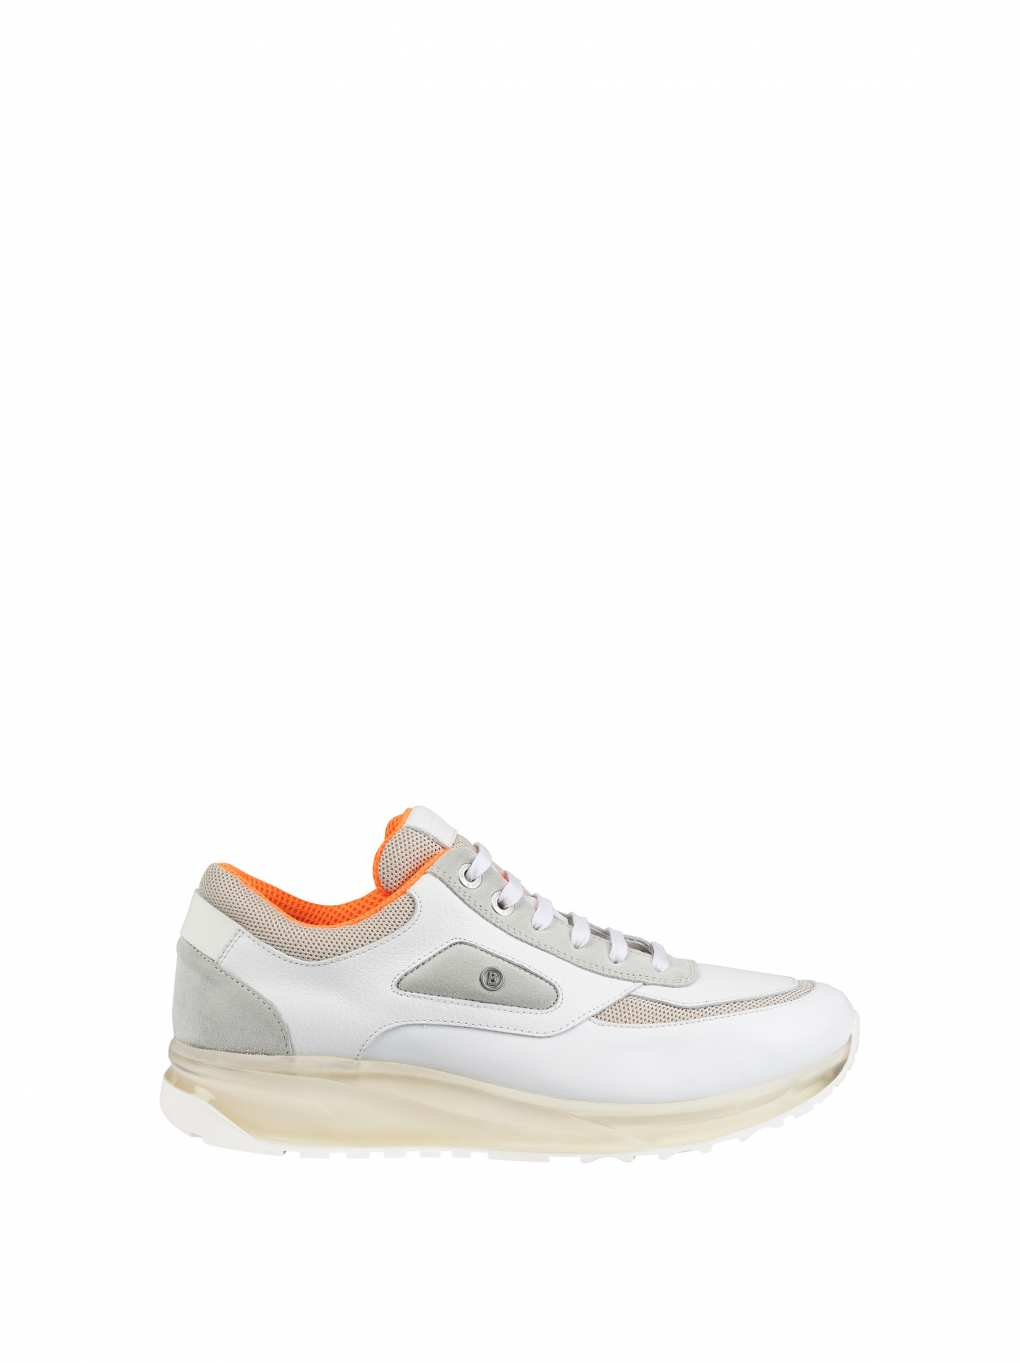 Кроссовки NEW YORK M1E Bogner Shoes man